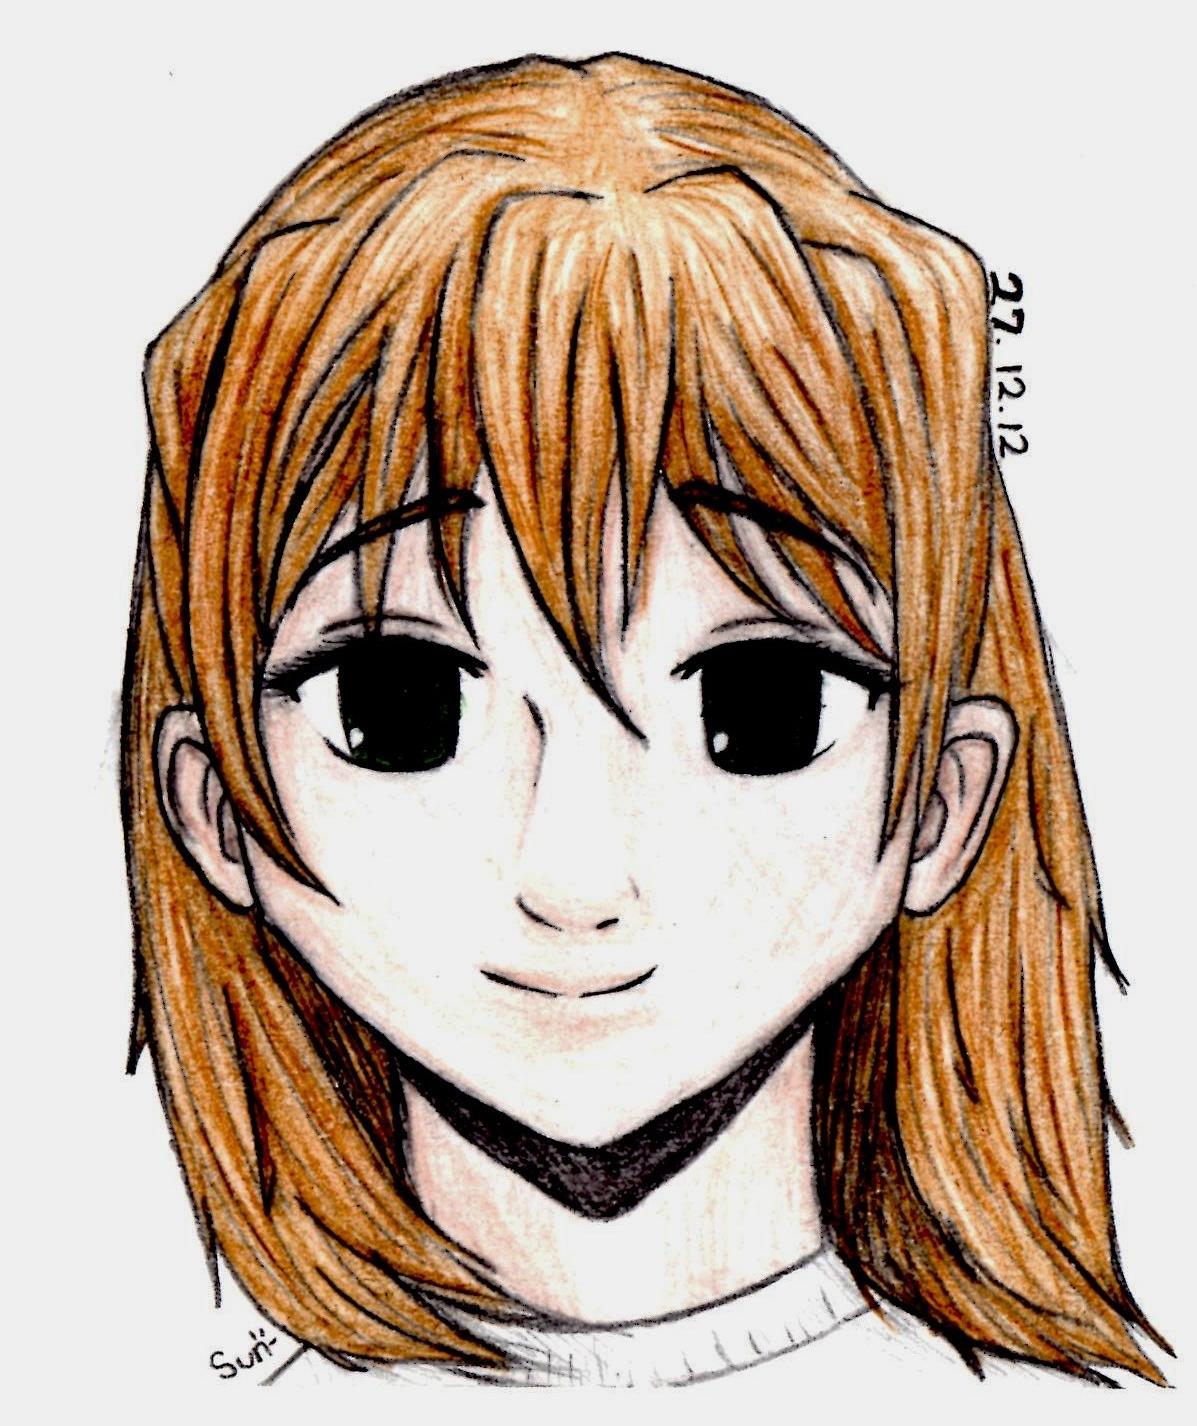 Random Character by Sunbeargirl